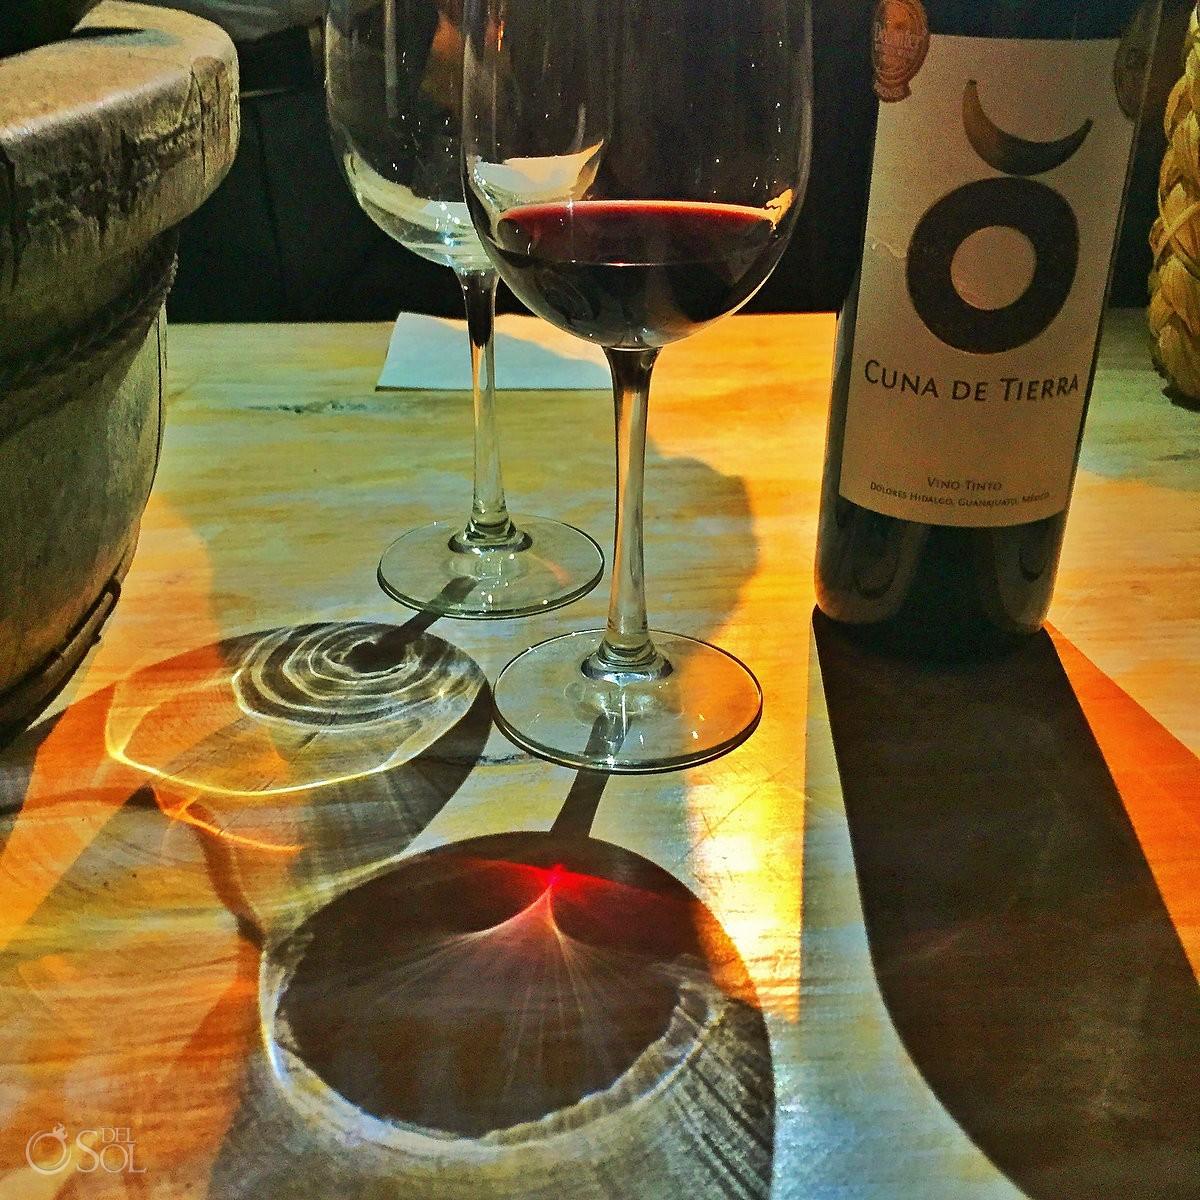 Cuna de Tierra organic wine from Mexico at Rosewood San Miguel de Allende